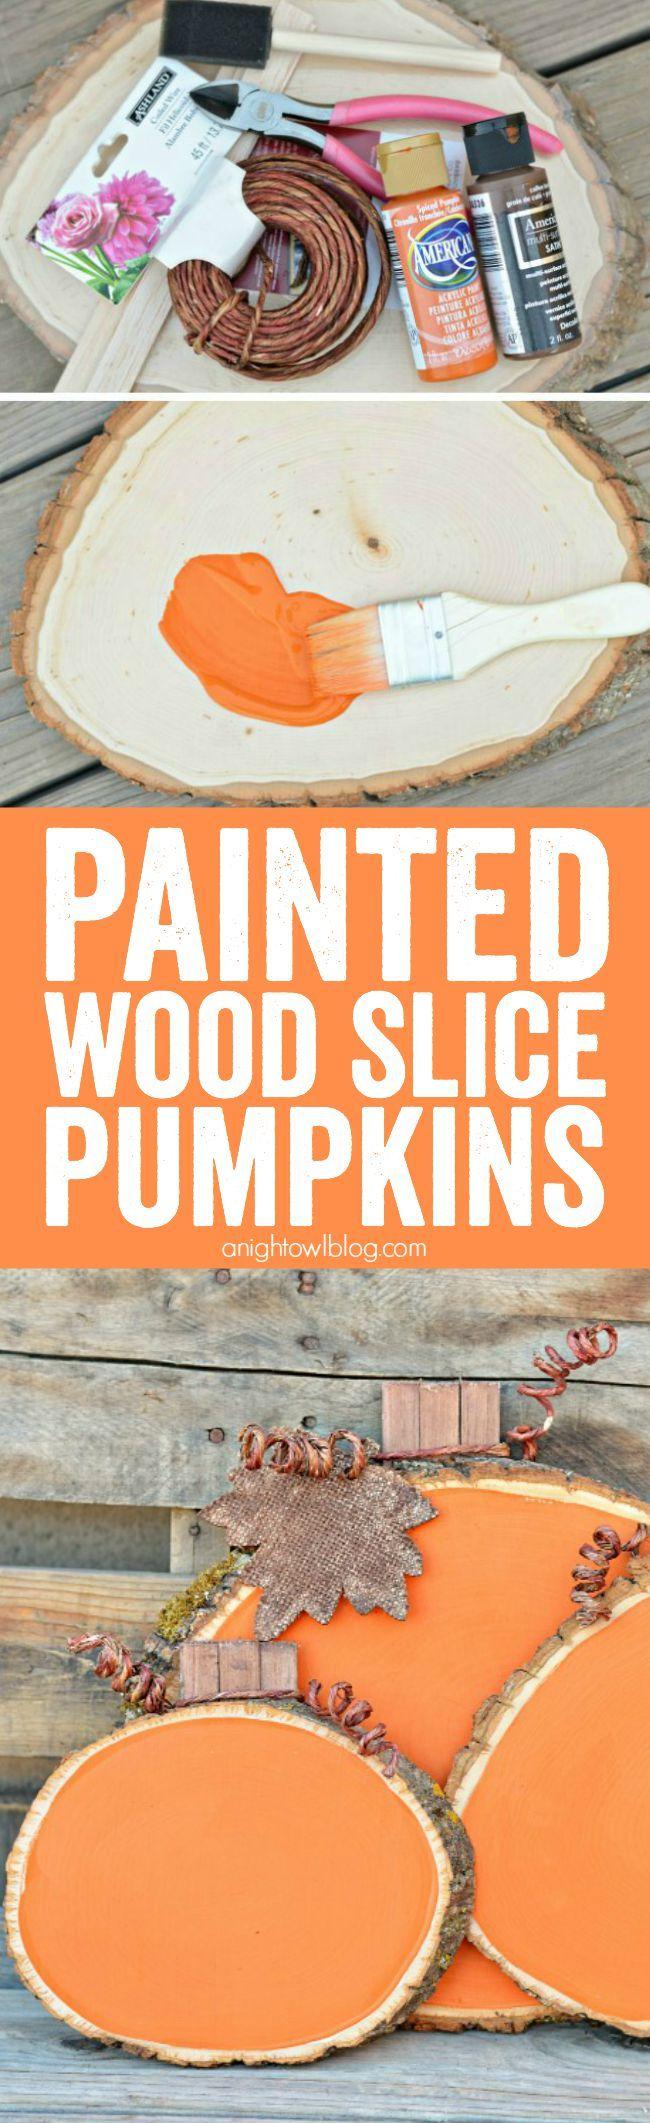 DIY Painted Wood Slice Pumpkins. Make adorable craft wood slice pumpkins from wood and paint!  Tutorial via